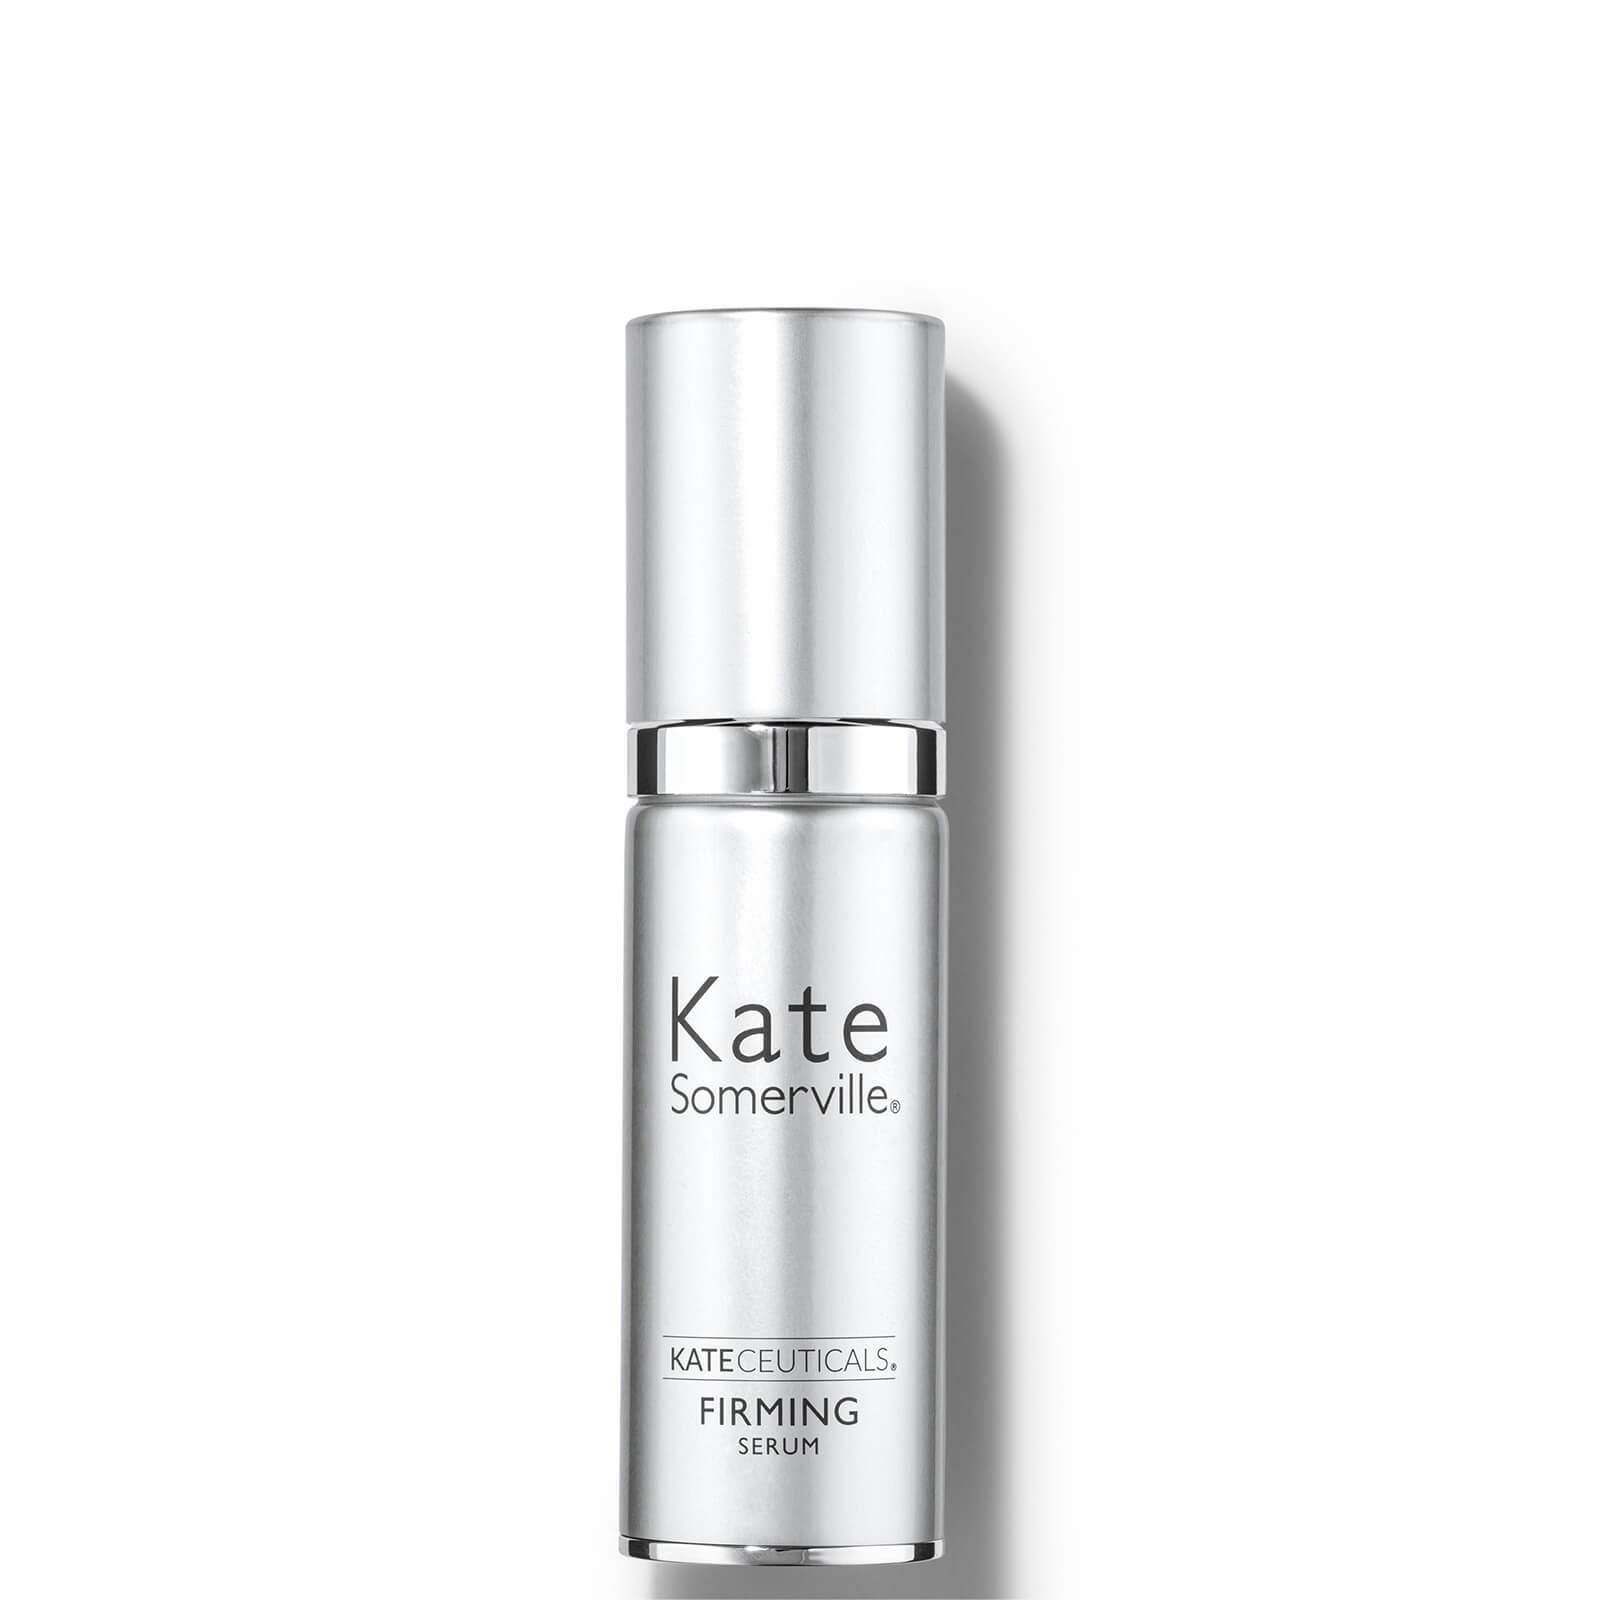 Kate Somerville KateCeuticals Firming Serum 30ml